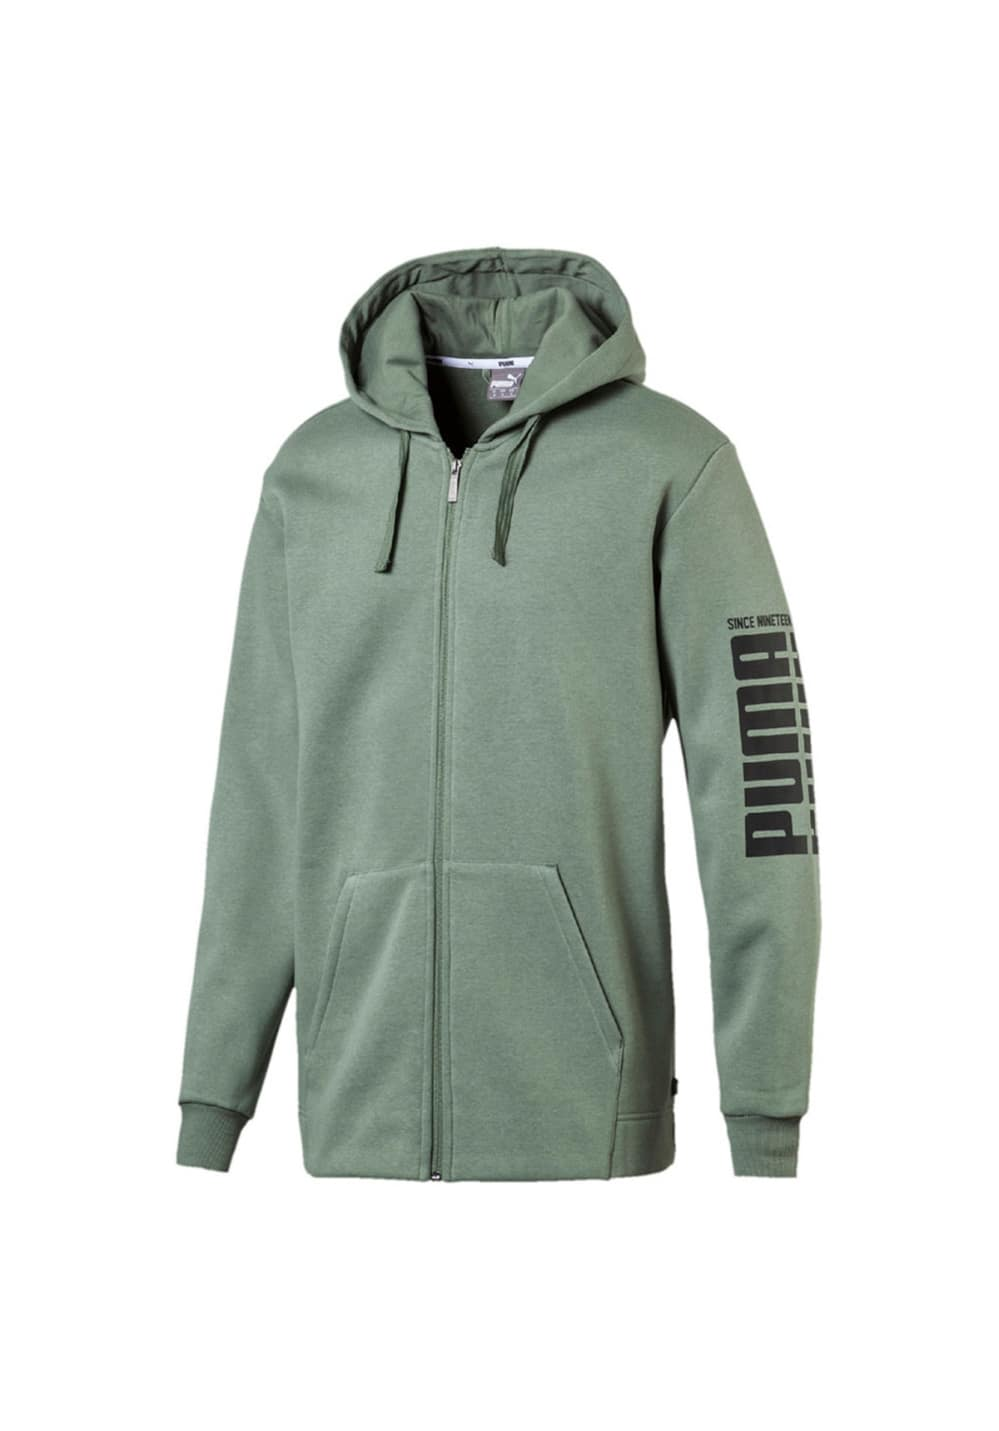 08116d9d4a Puma Rebel Bold FZ Hoody FL - Casual clothing for Men - Green